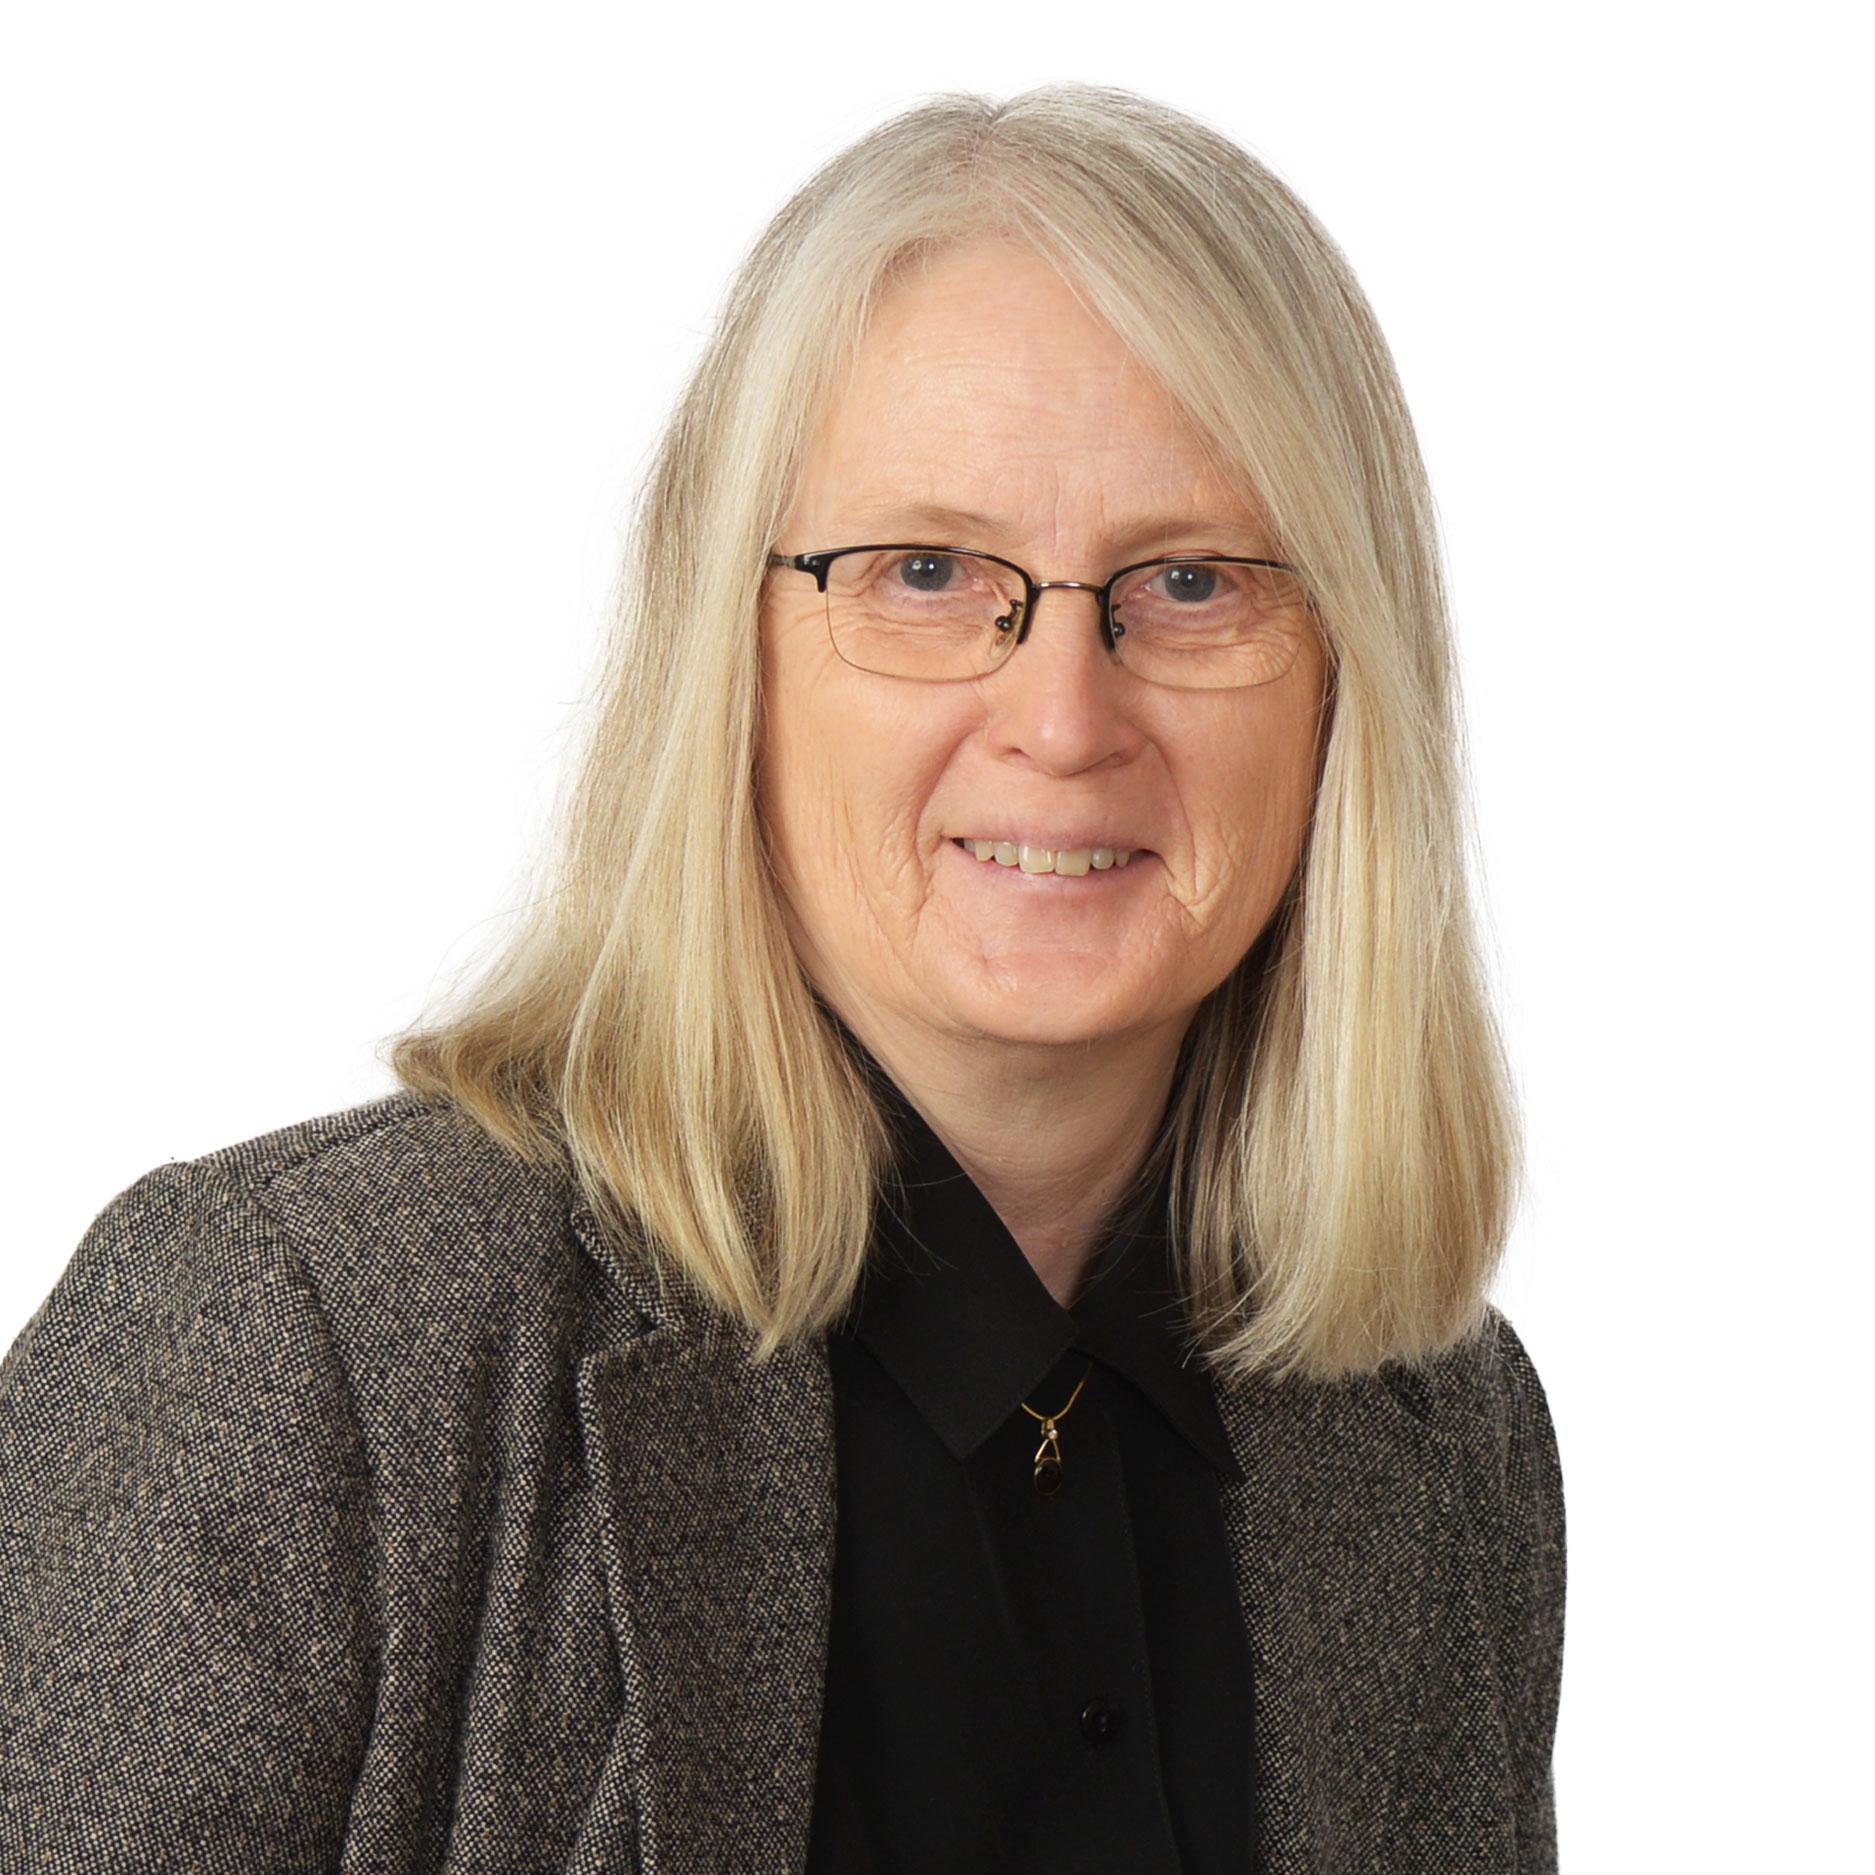 Linda Enghagen